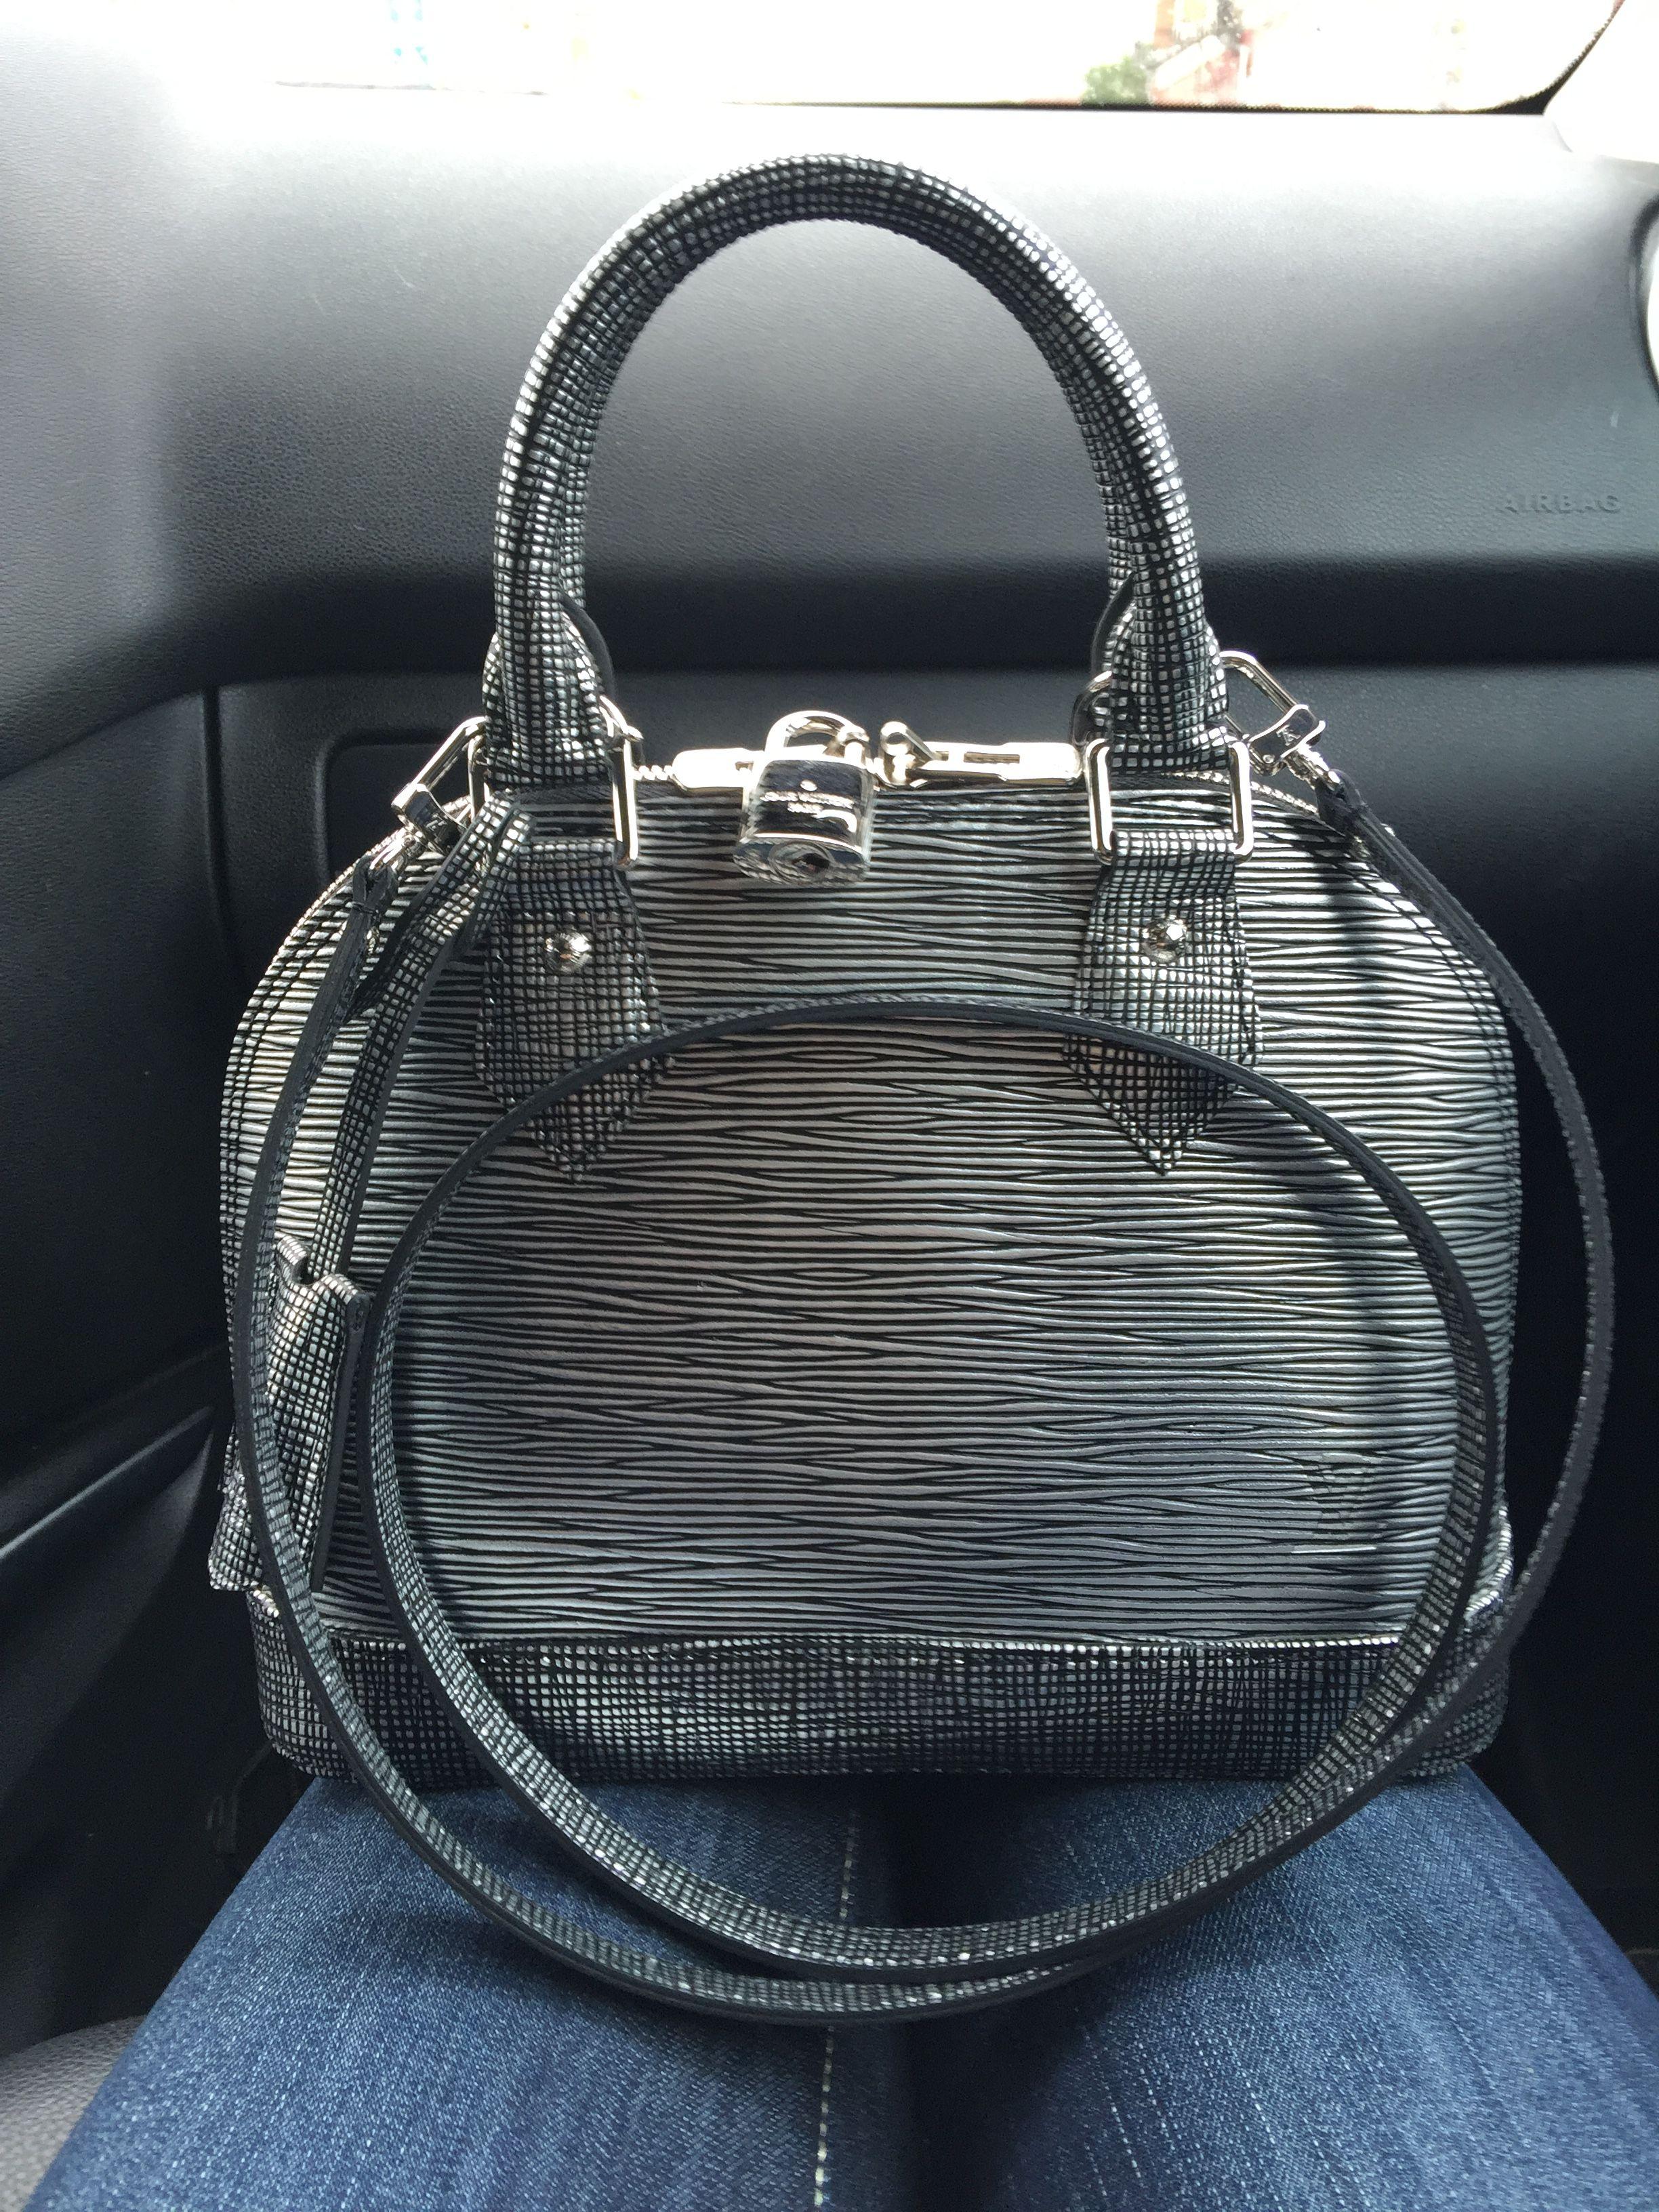 3a5a6e5460ff Louis Vuitton Alma BB black silver 2016 limited edition